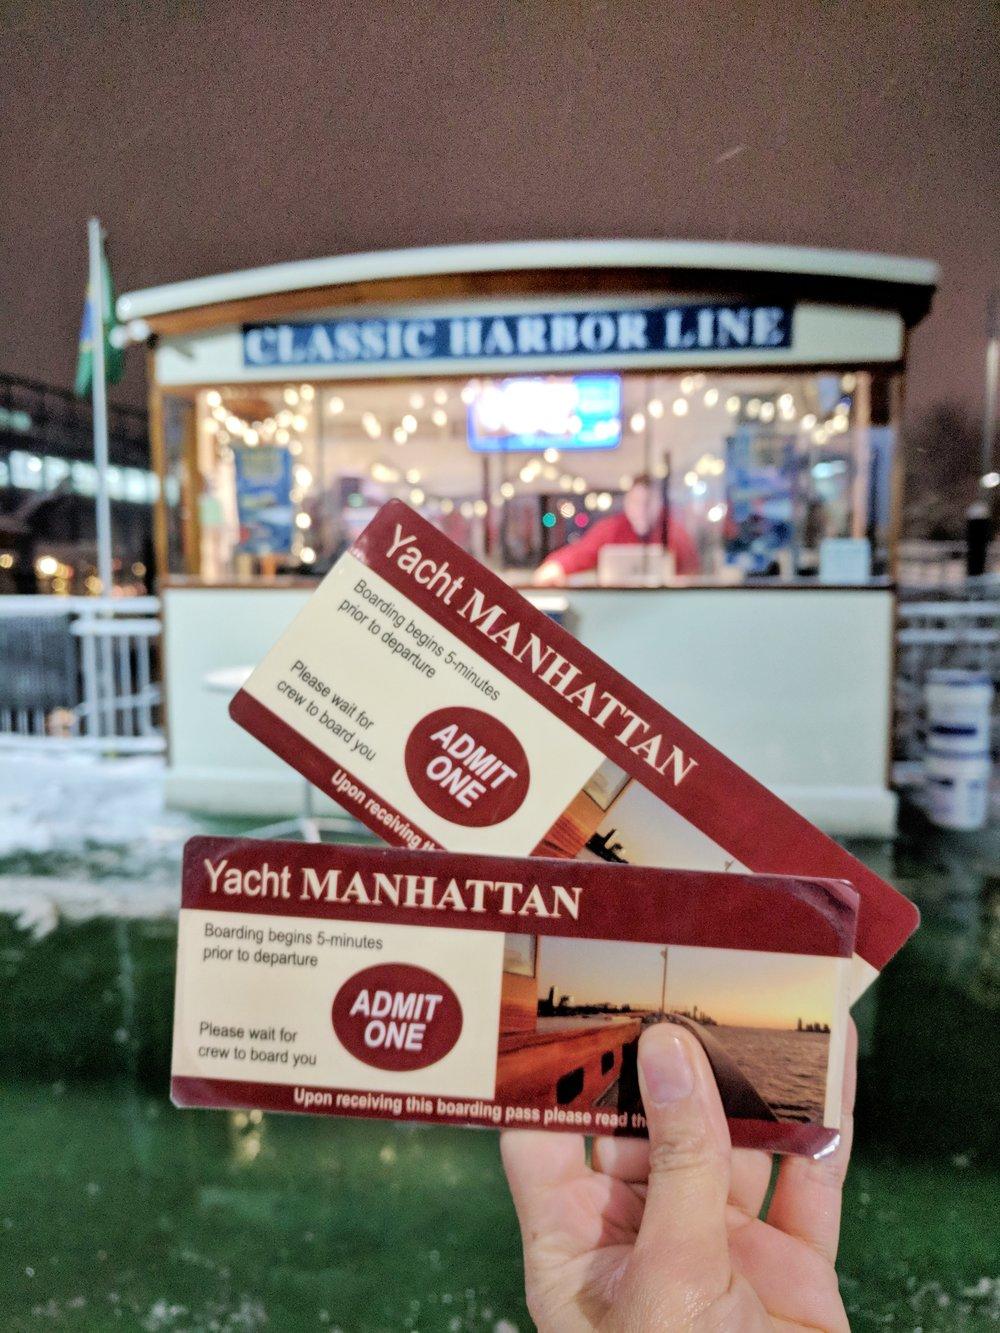 Classic-Harbor-Line-yacht-tickets.jpg